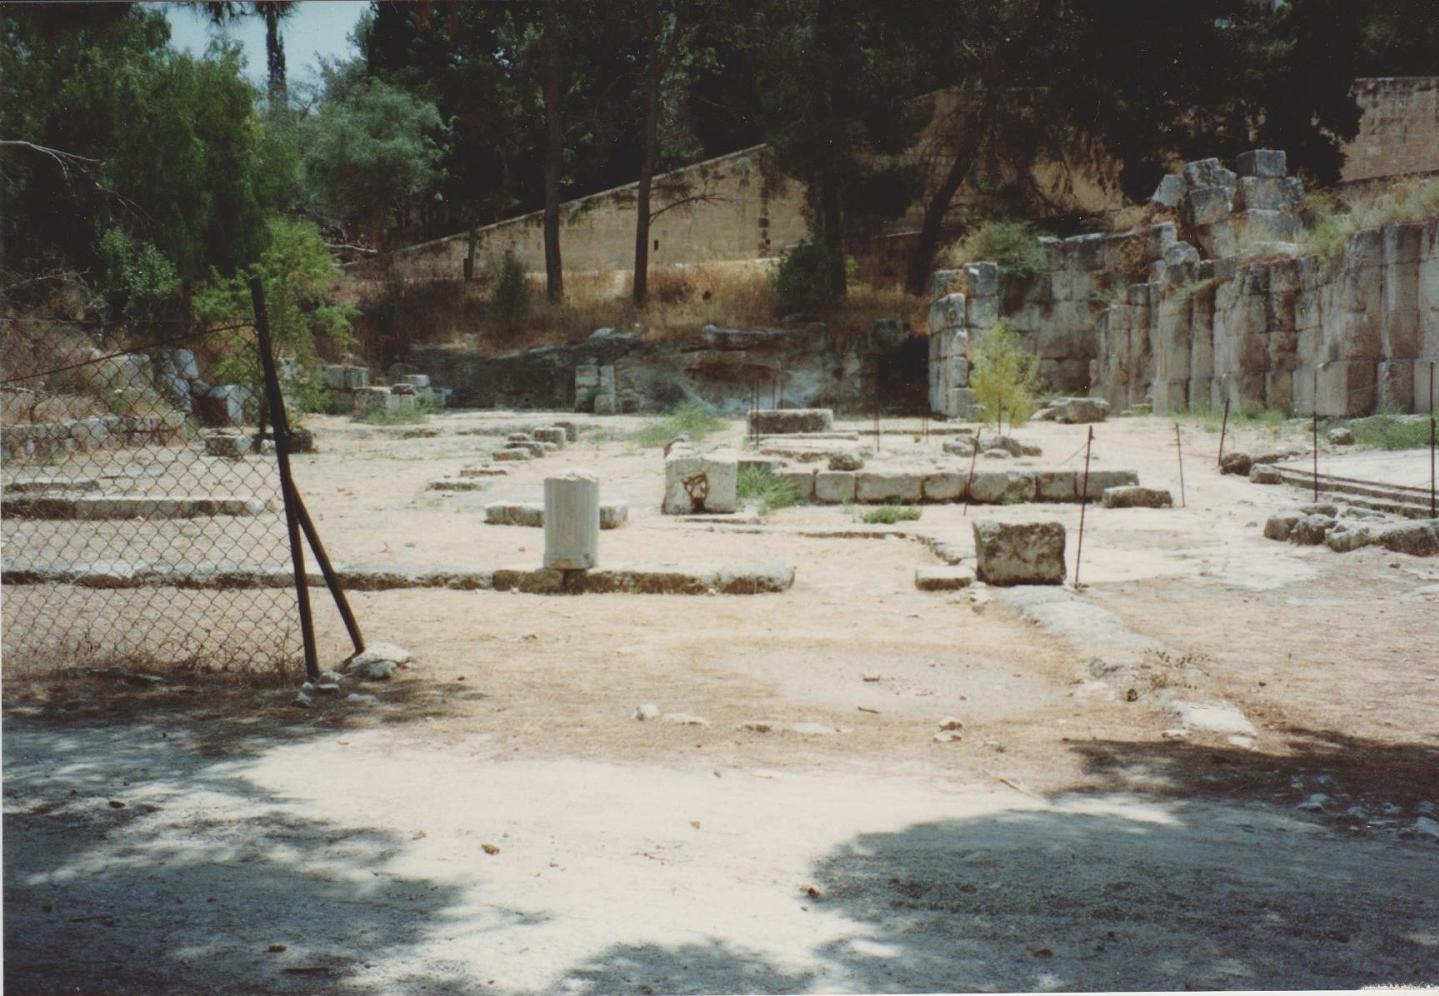 The Roman 'villa' close to the Roman-Byzantine bathhouse at Latrun. Summer 1990. Credit: Eleanor Scott